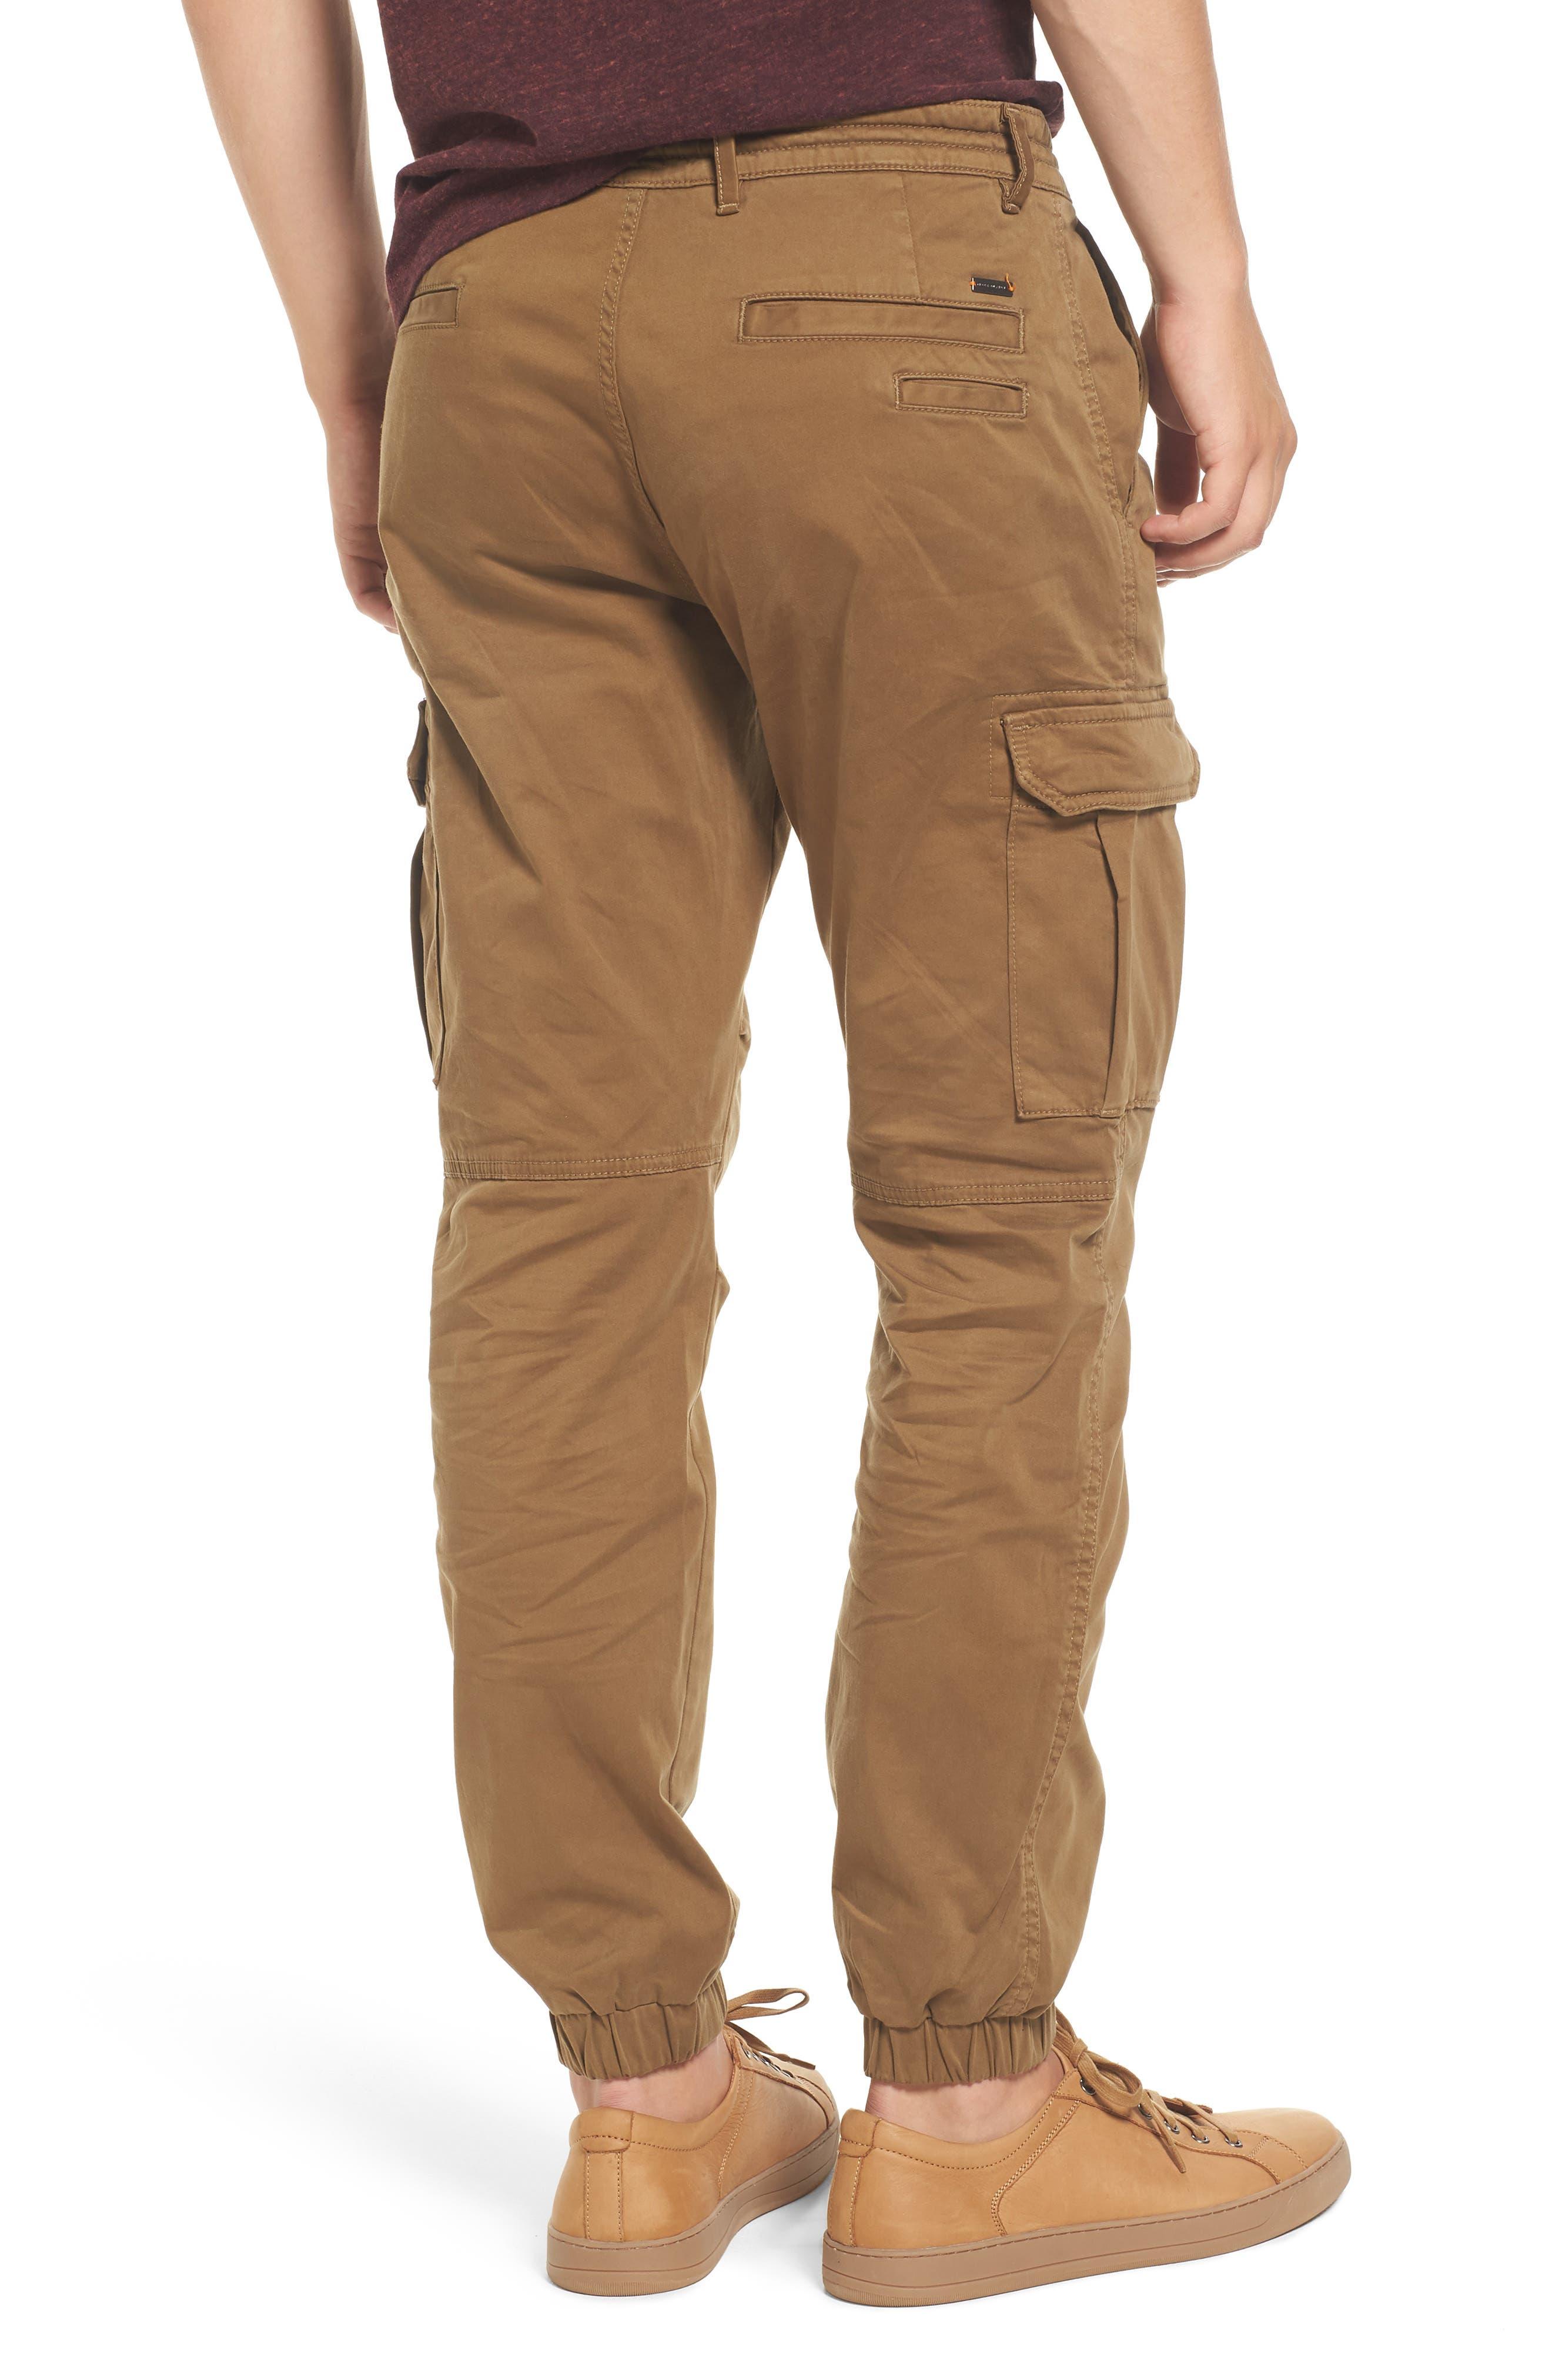 Shay 2 Cargo Pants,                             Alternate thumbnail 2, color,                             Open Beige